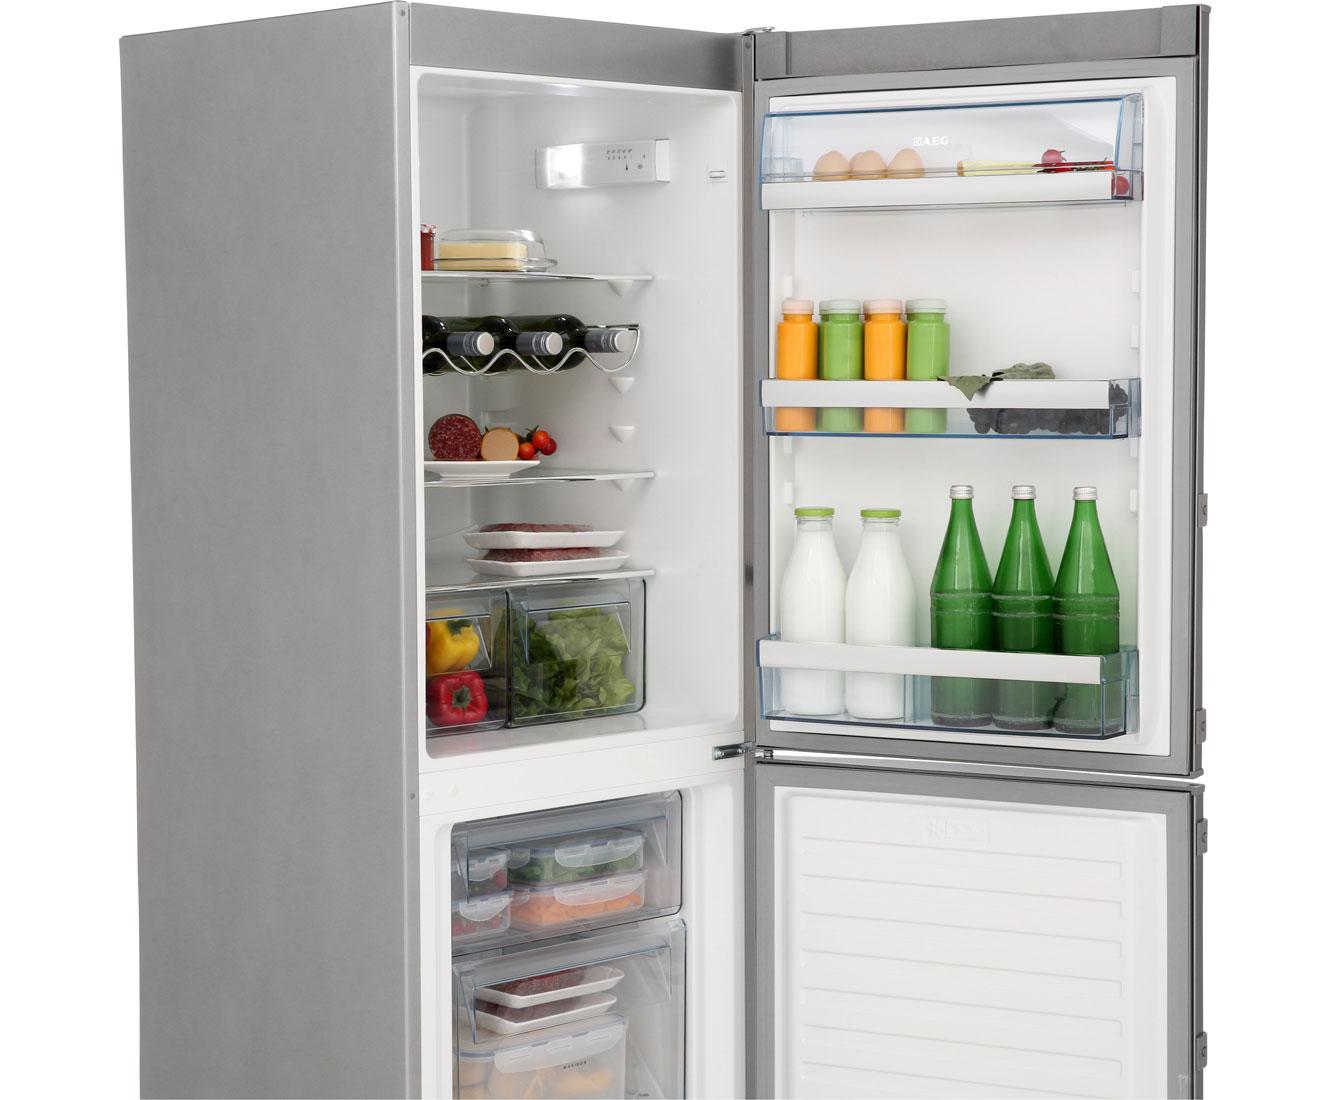 Aeg Kühlschrank Geräusche : Aeg kühlschrank macht komische geräusche aeg ske ac kühlschrank l